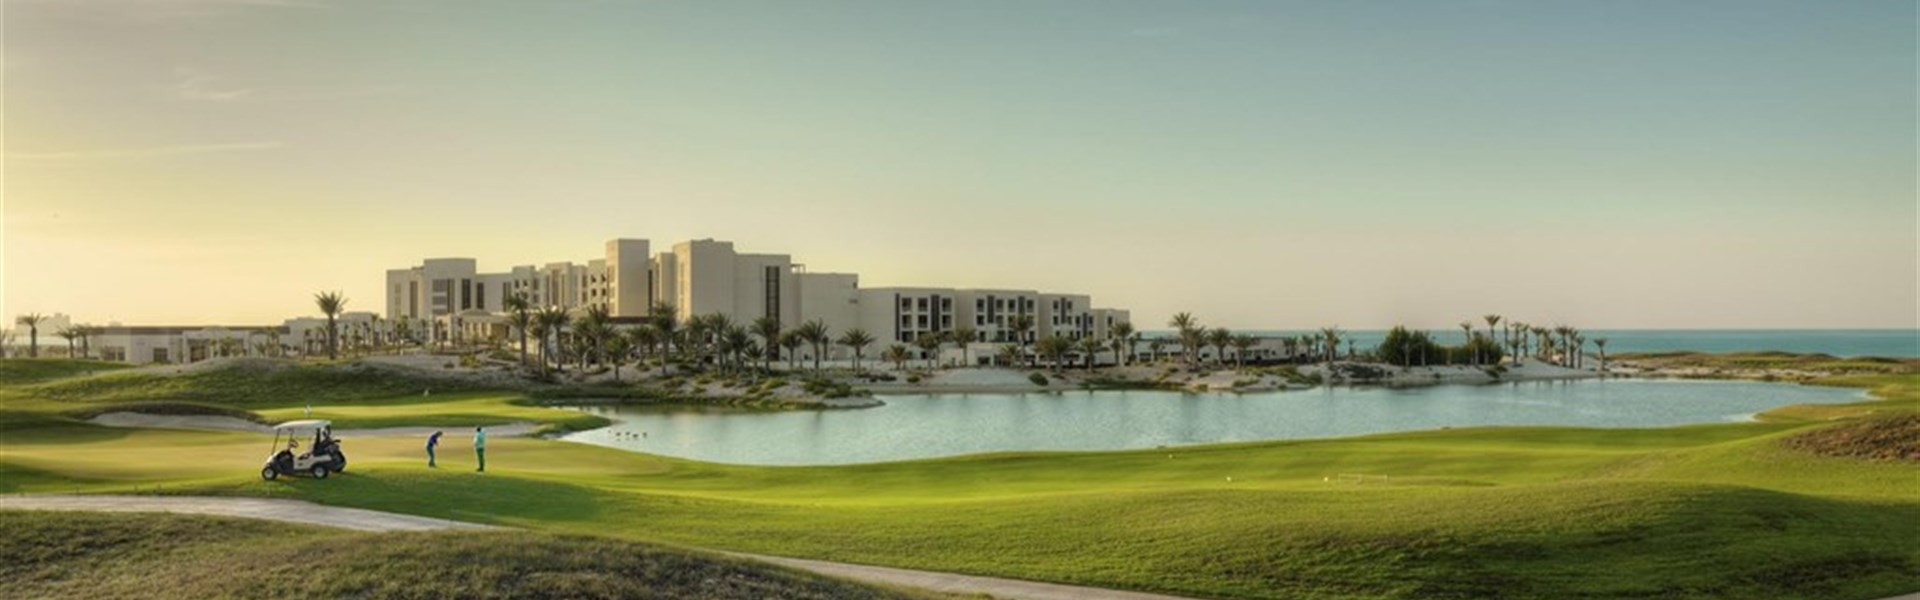 Luxusní golf v Abu Dhabi -